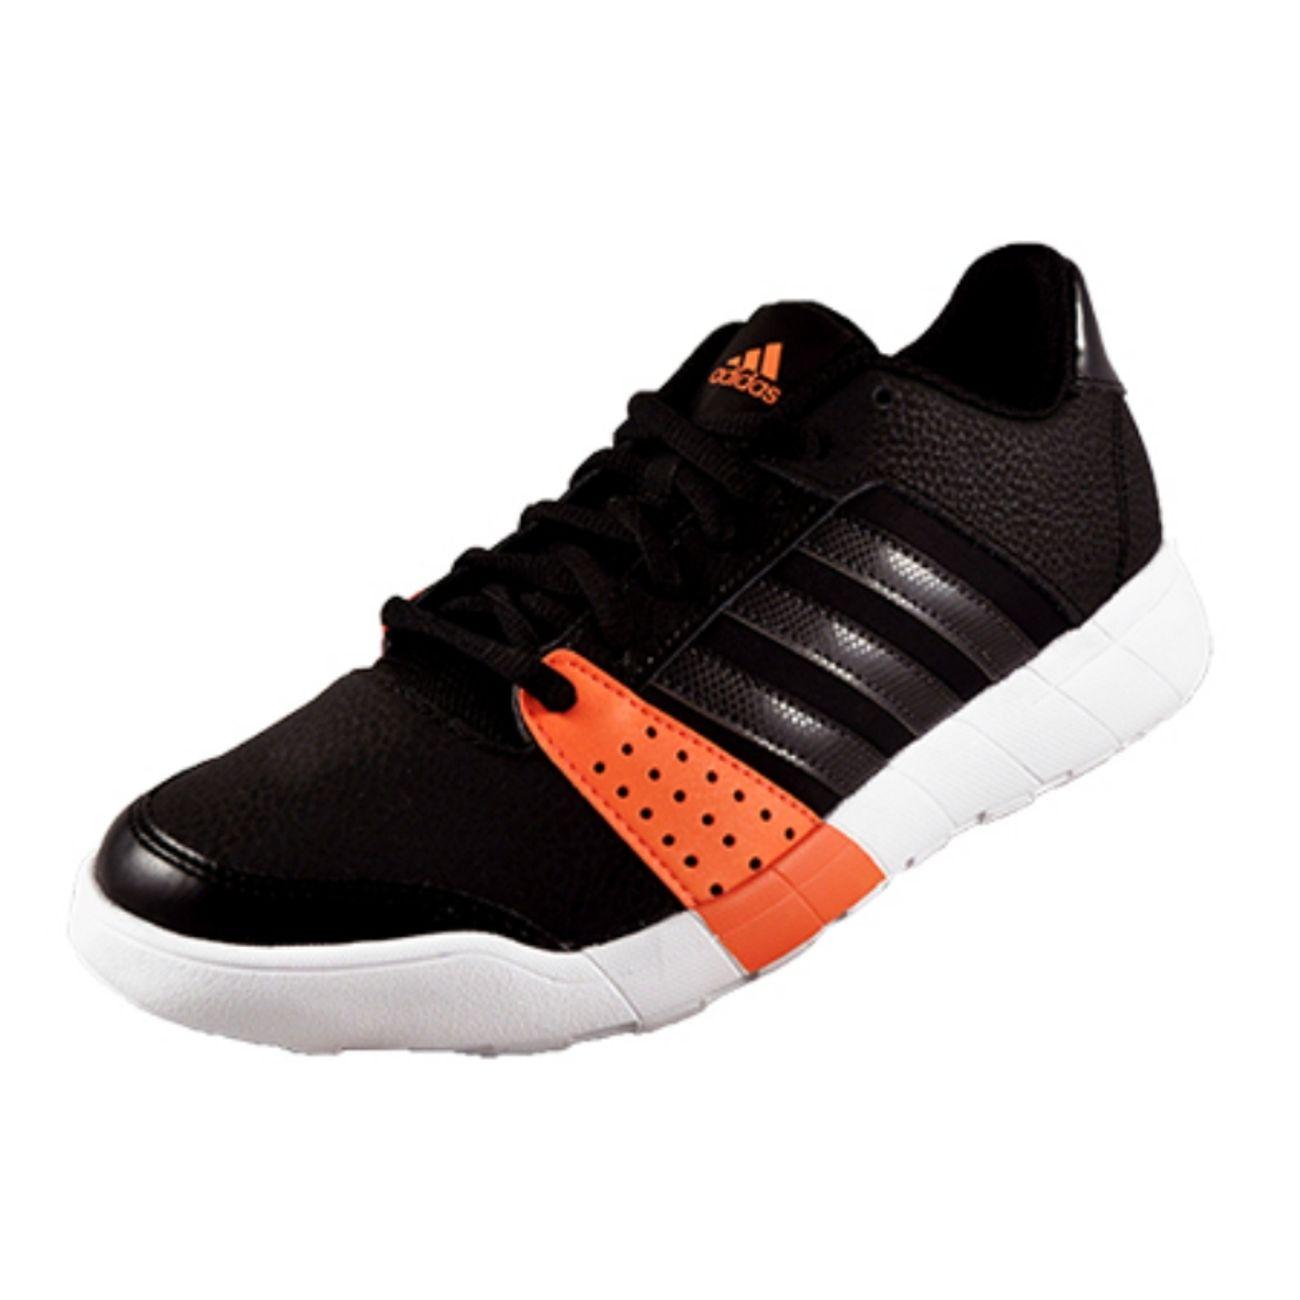 Femmes Running Sportives Baskets Adidas Chaussures Fun Essential De yvmn0w8NO